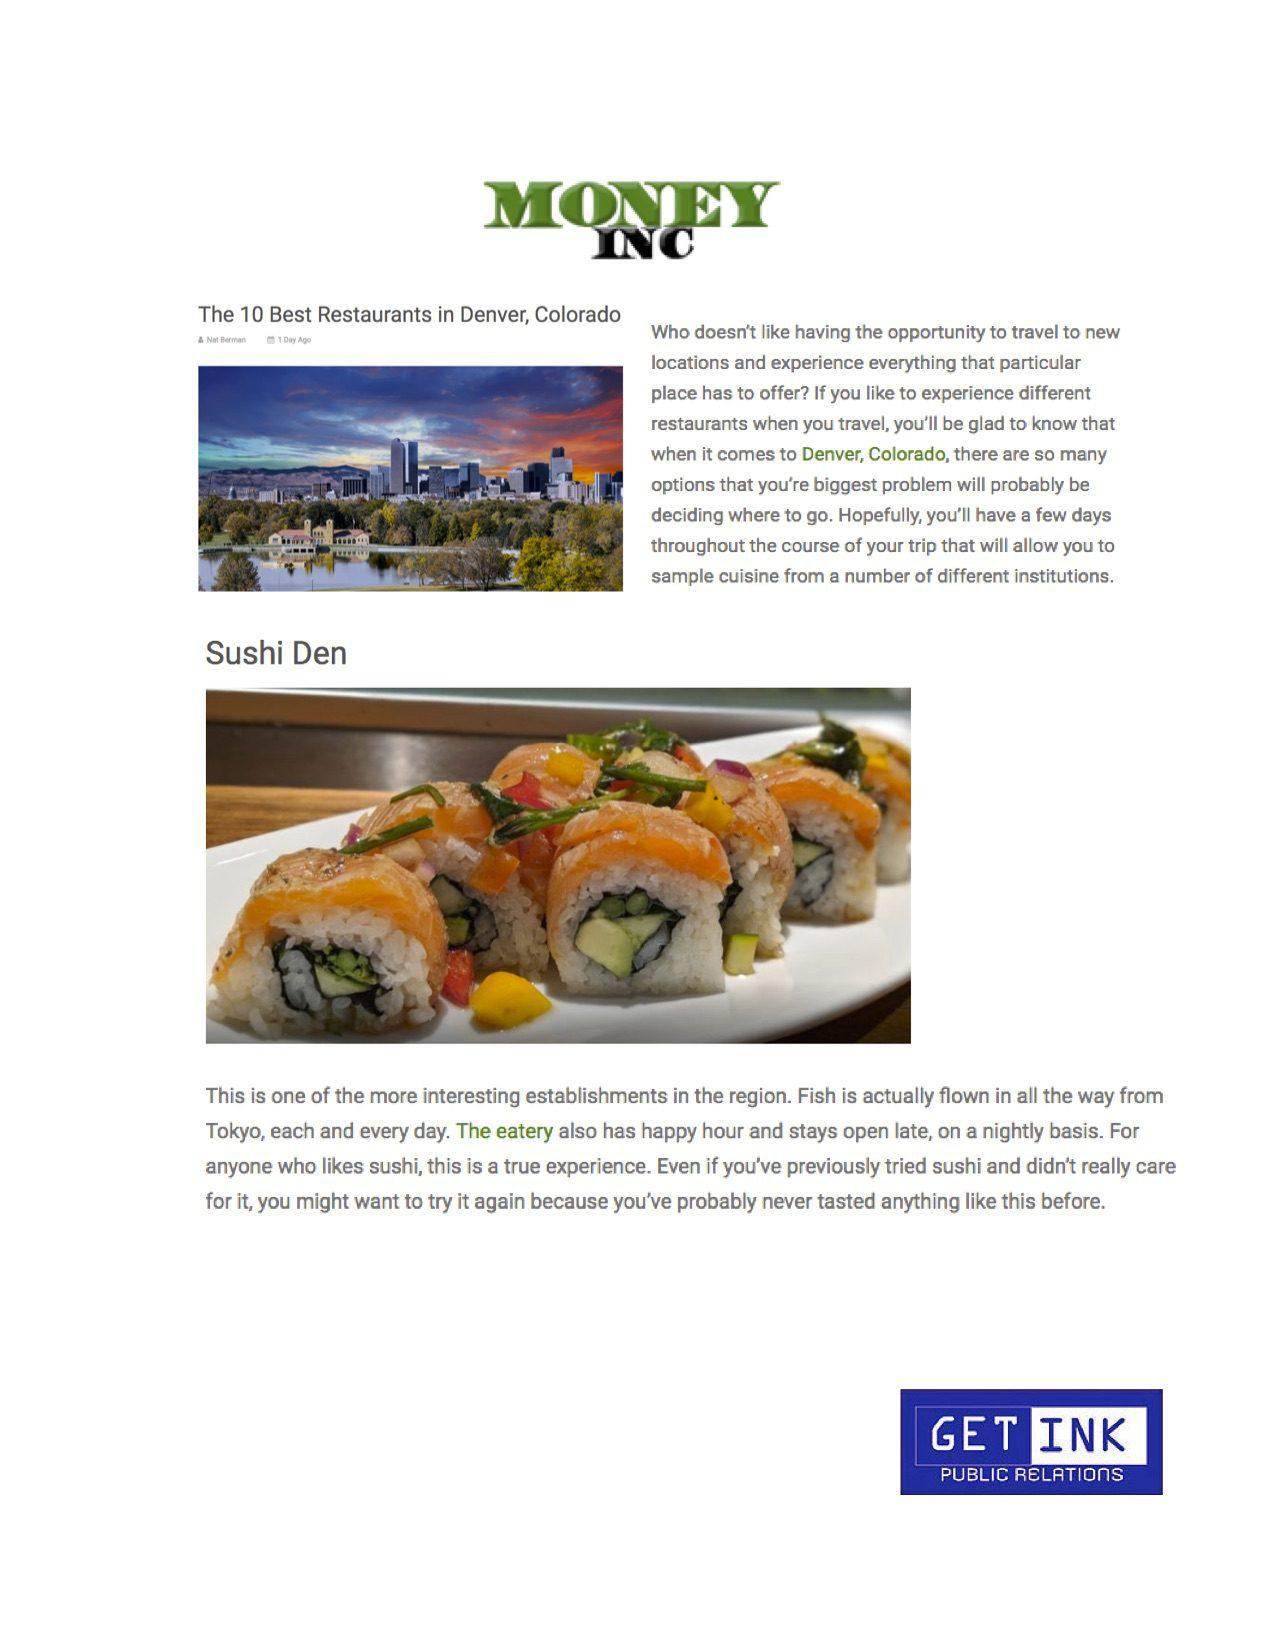 Best restaurant Denver Sushi Den in Money Inc - Get Ink Pr clients